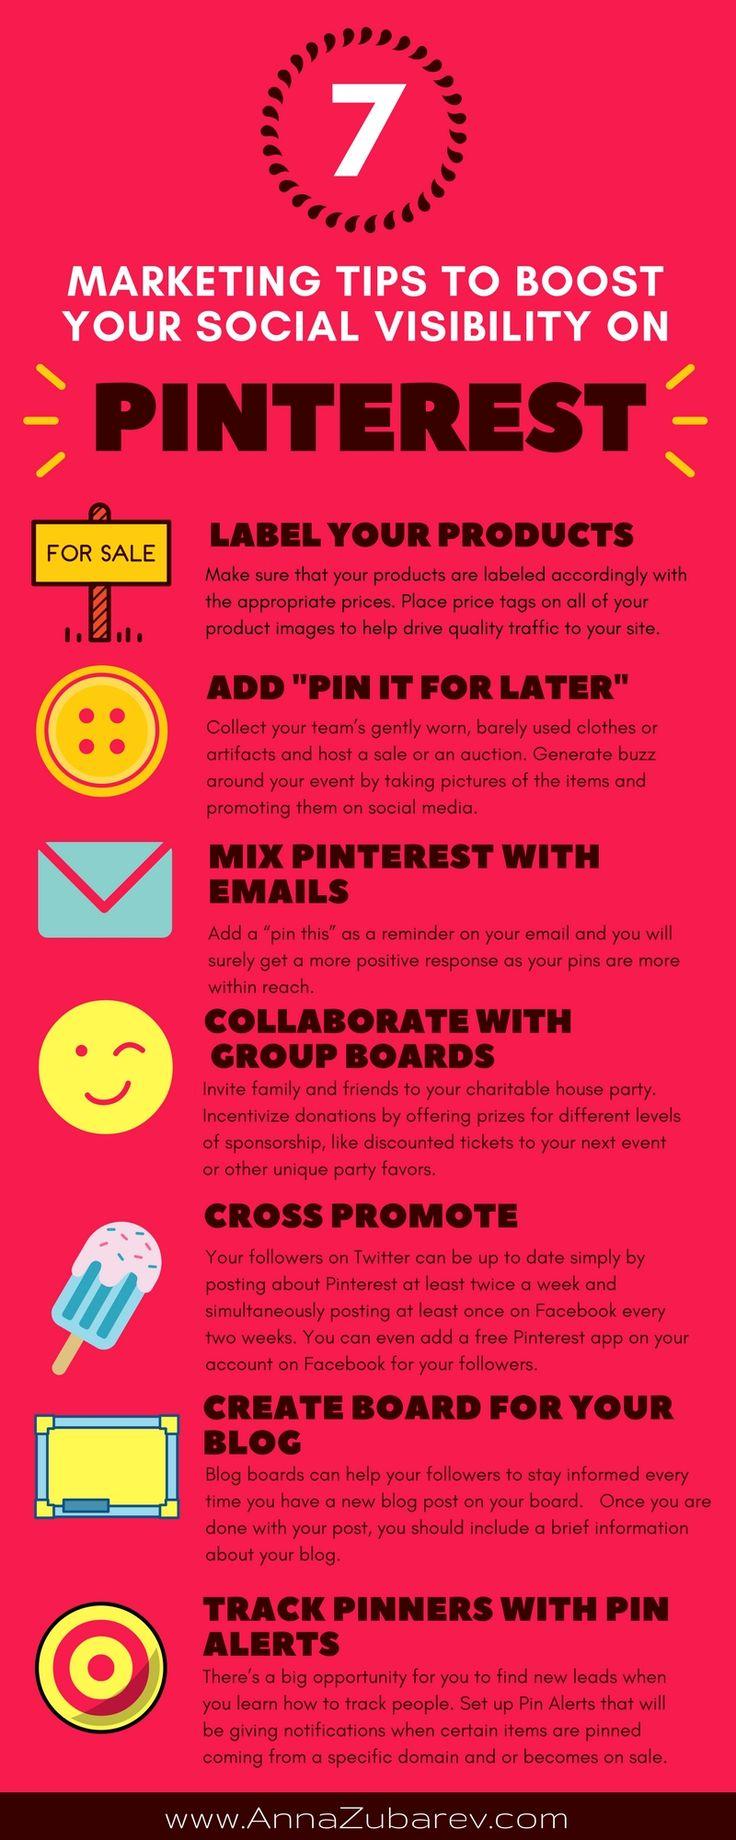 7 Marketing Tips to Boost Your Social Visibility on Pinterest. via @annazubarev via @https://www.pinterest.com/annazubarev/